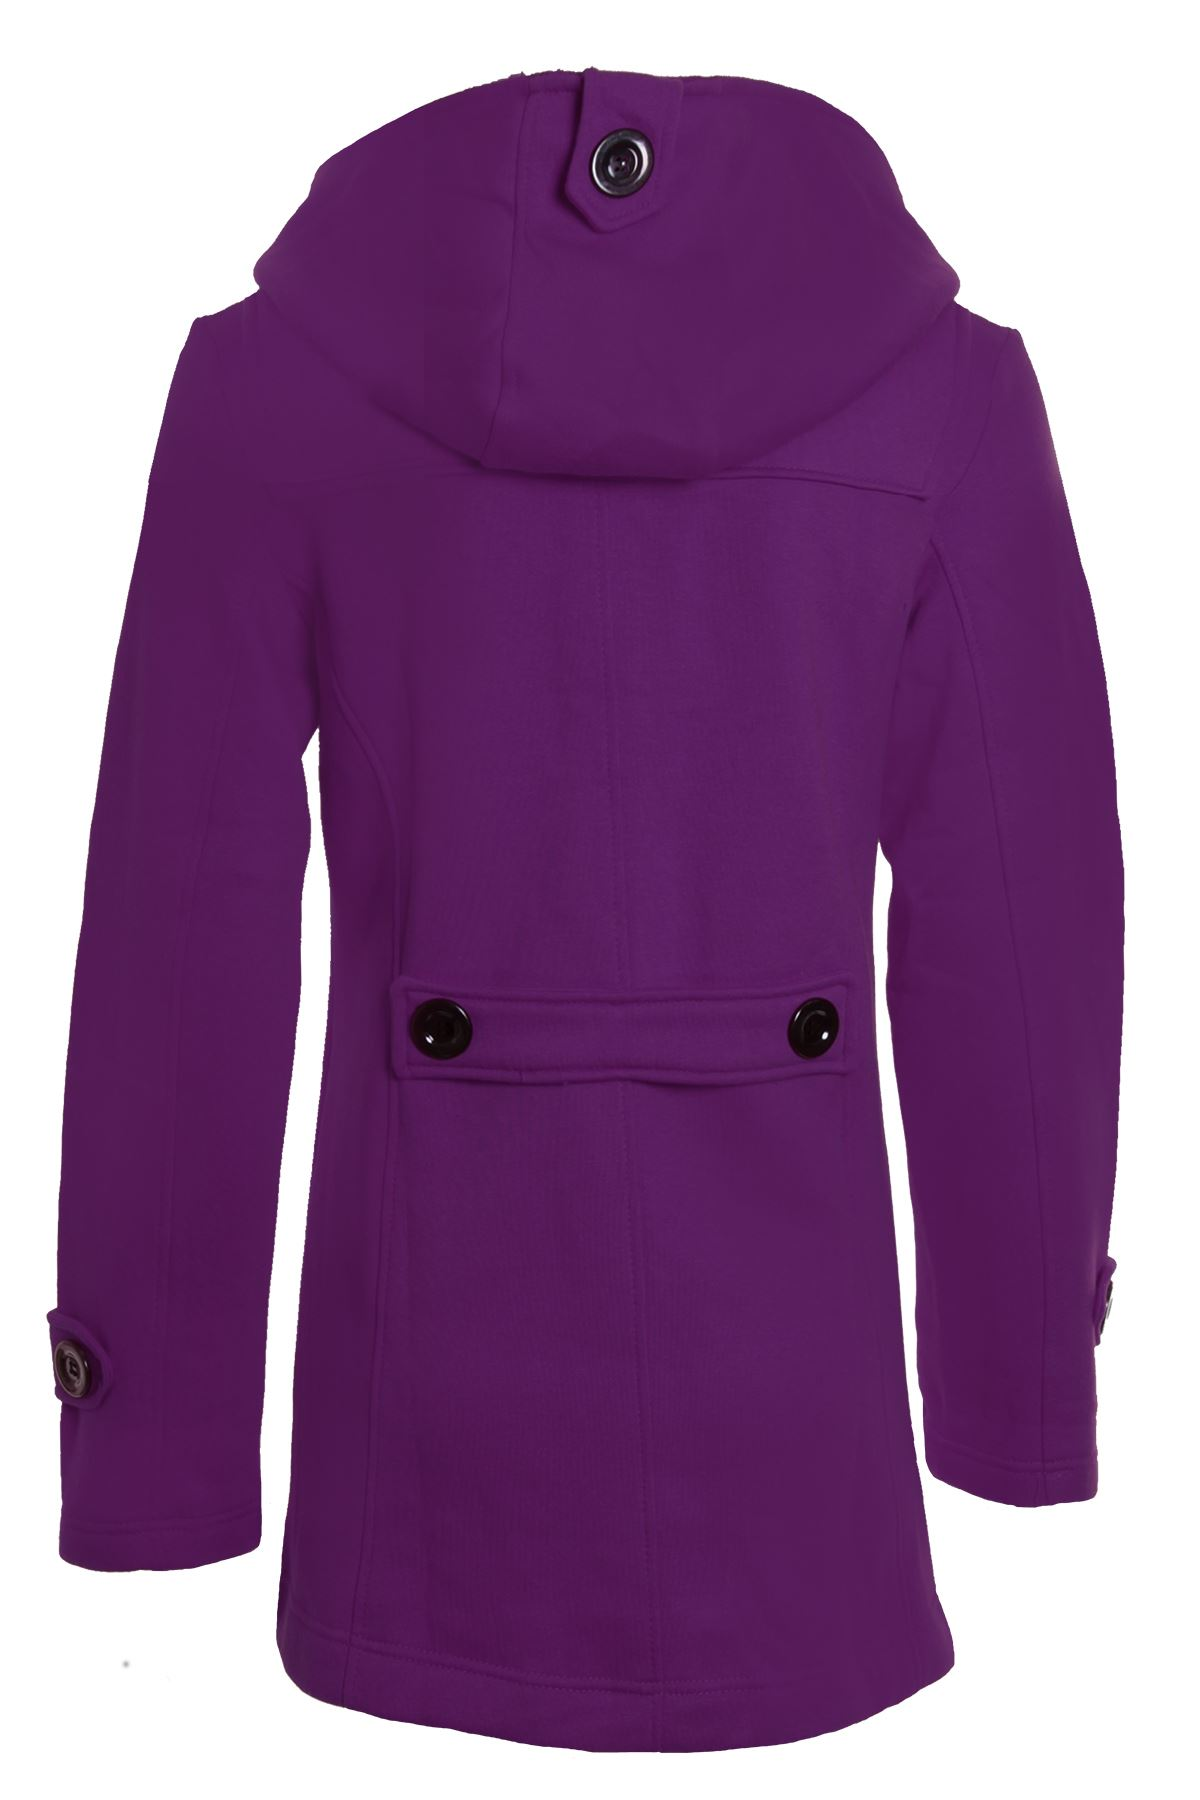 Womens duffle coats with hood